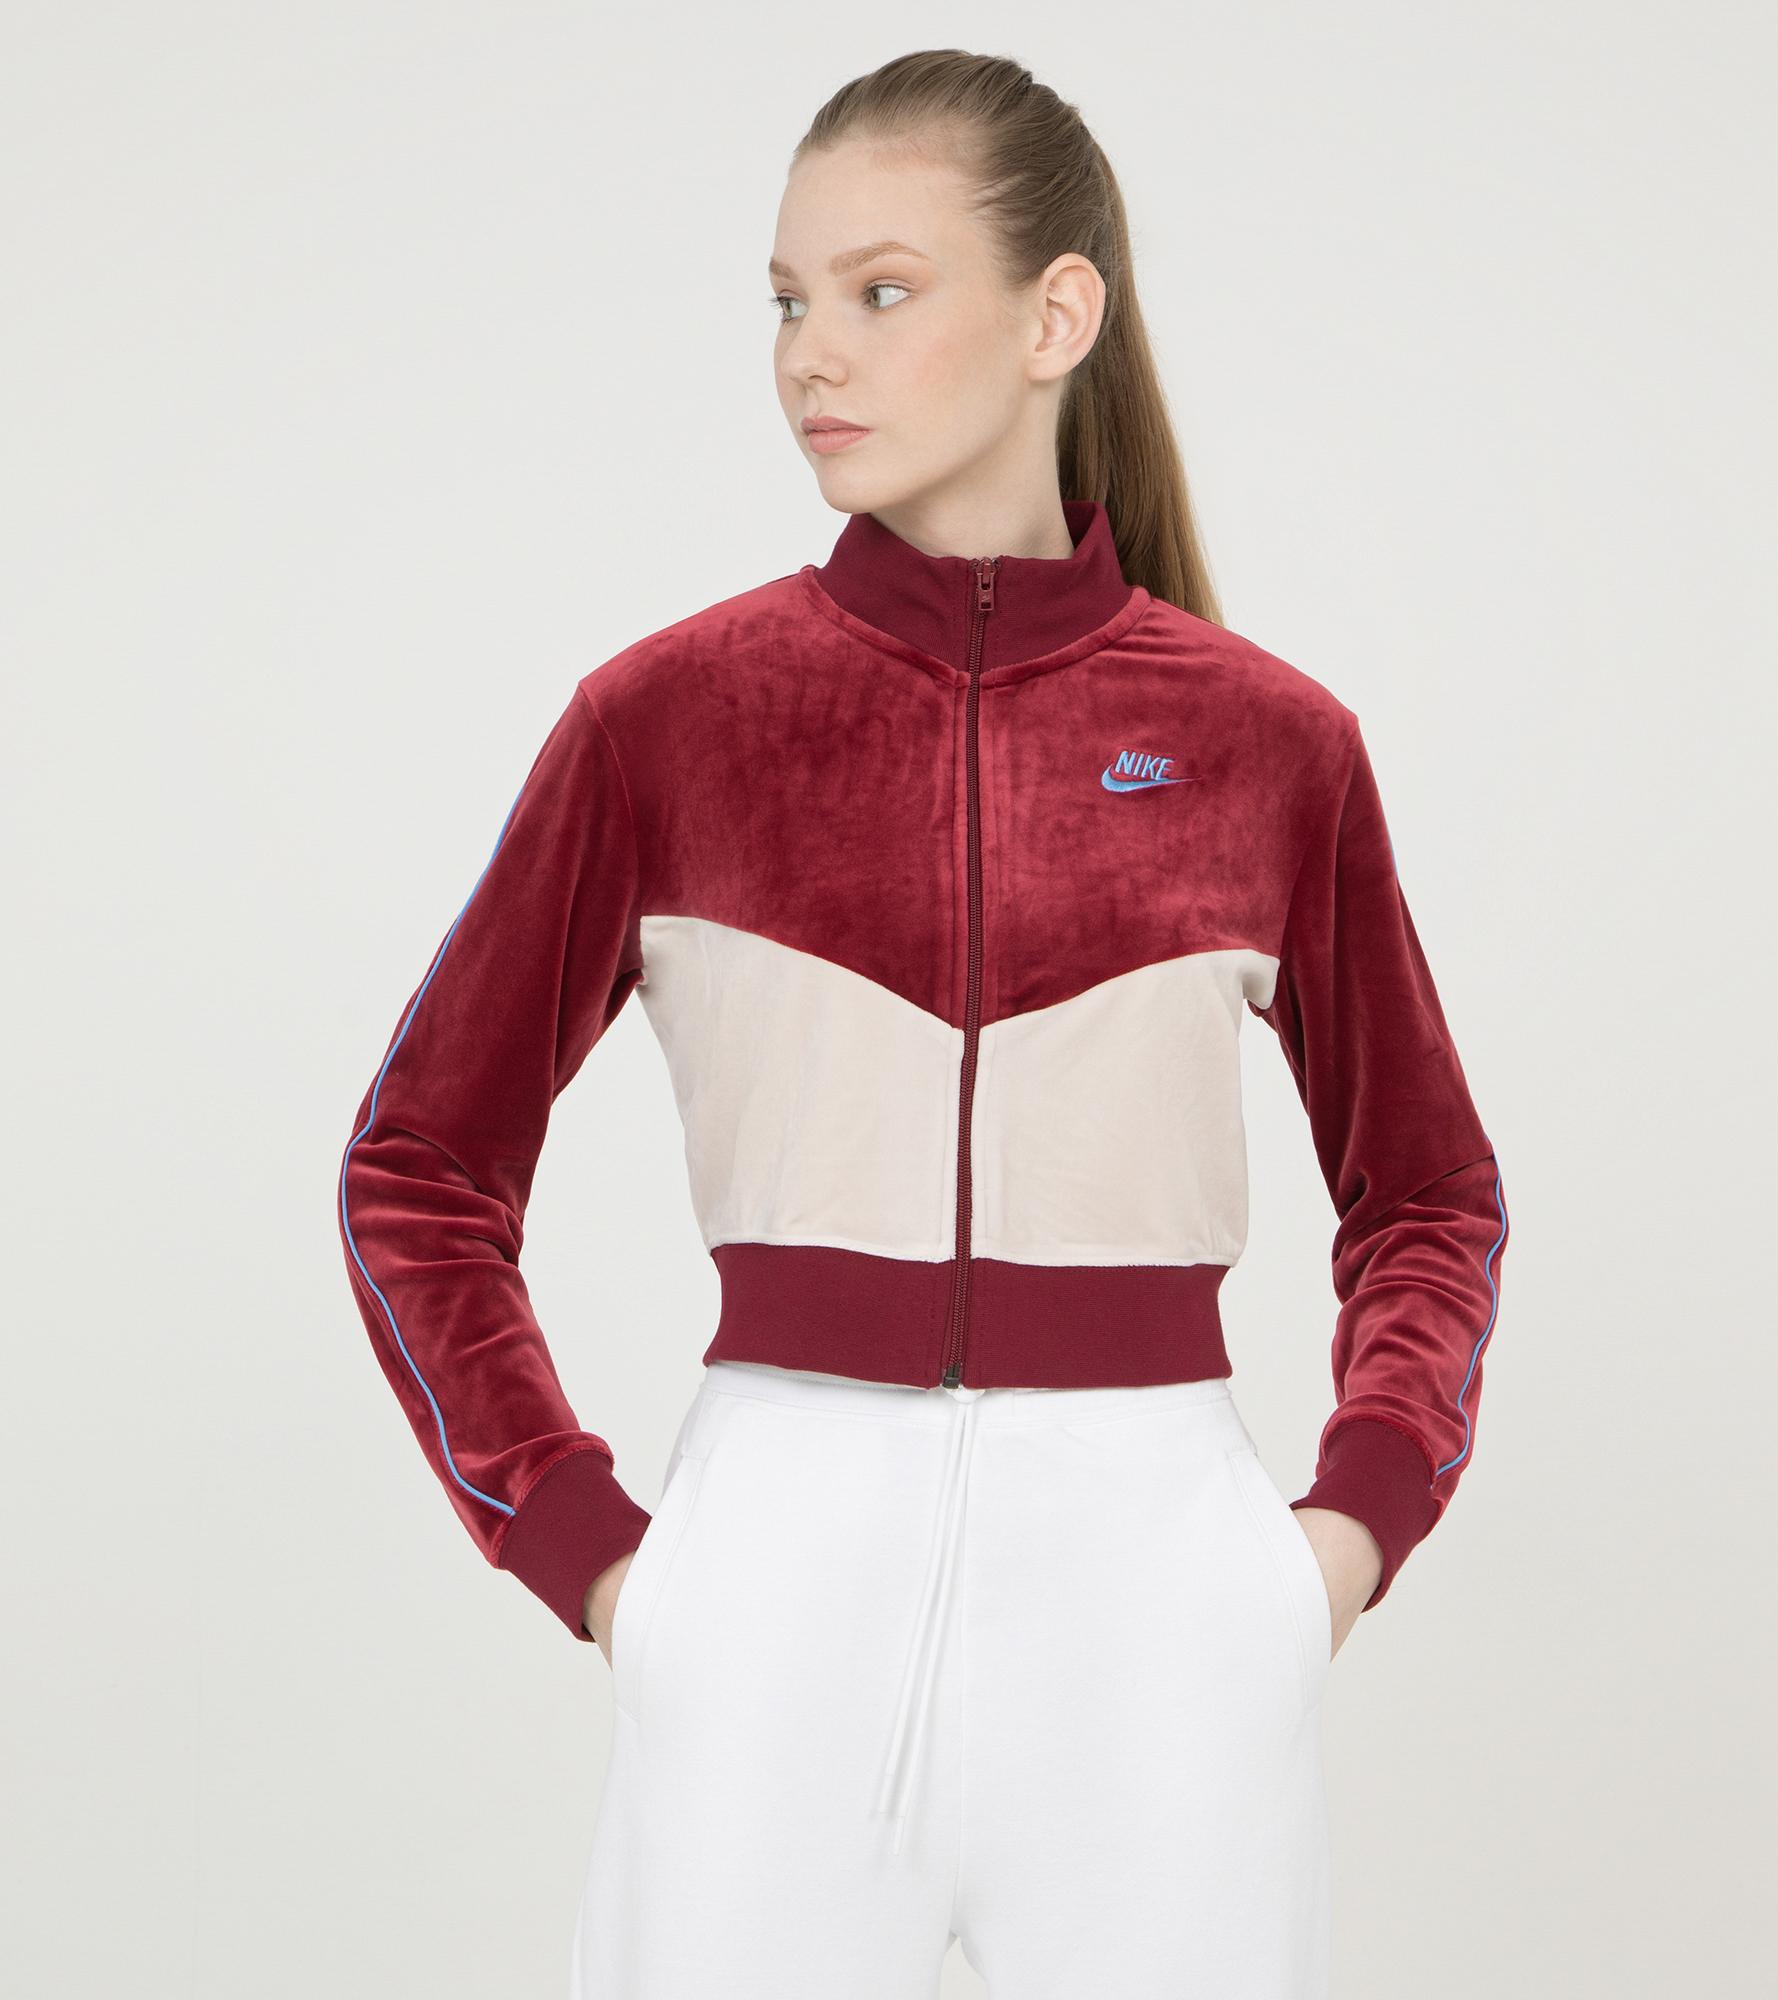 цена Nike Олимпийка женская Nike Heritage, размер 48-50 онлайн в 2017 году